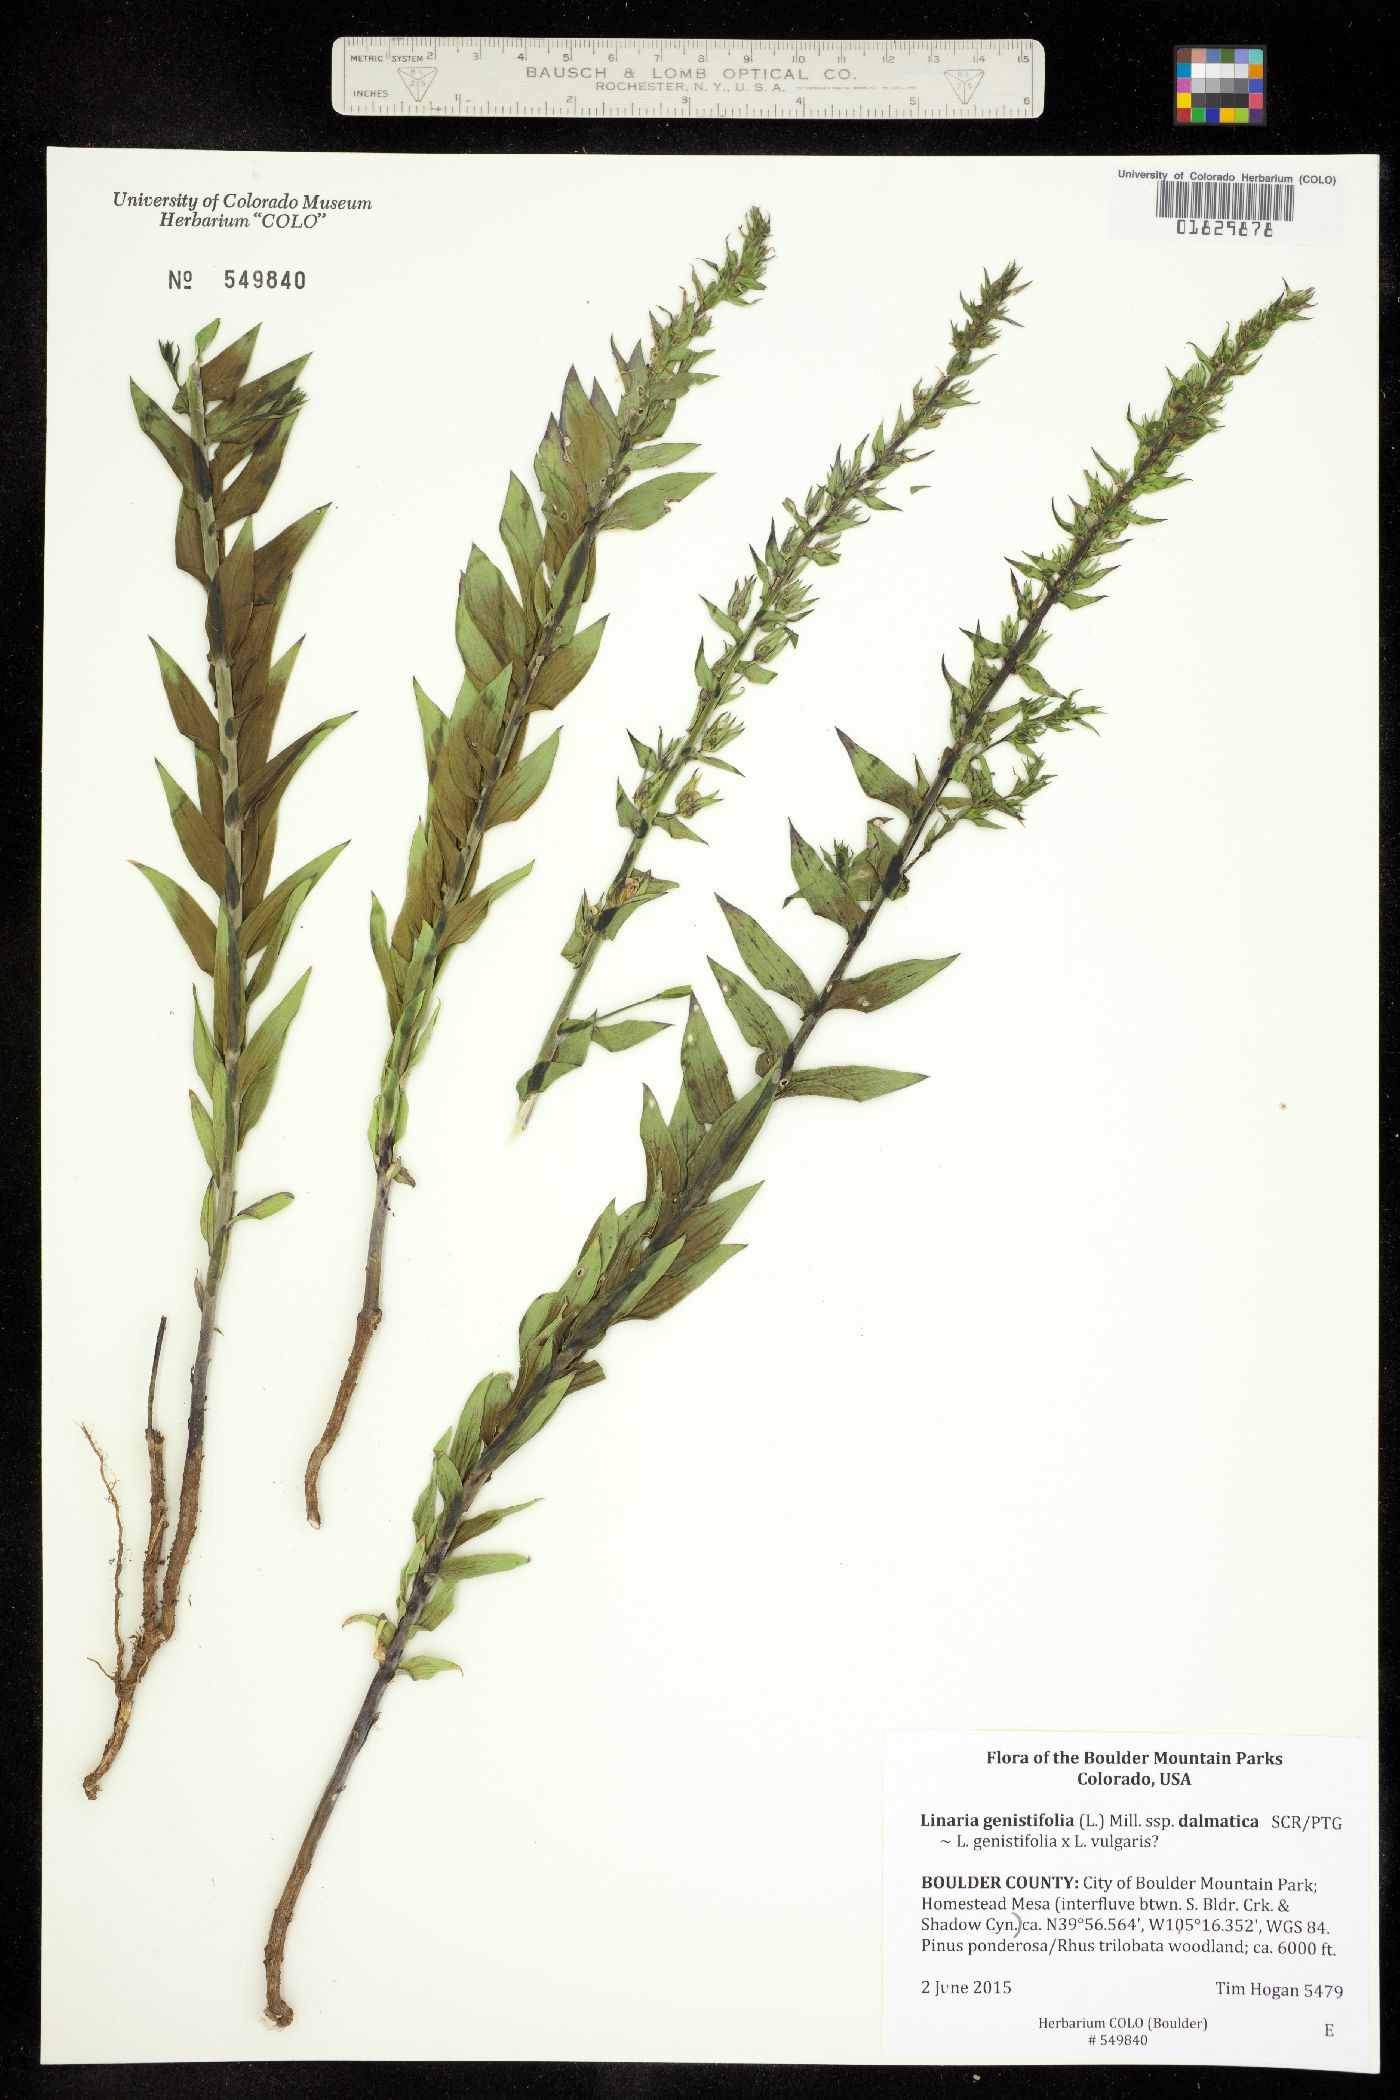 Linaria genistifolia ssp. dalmatica image